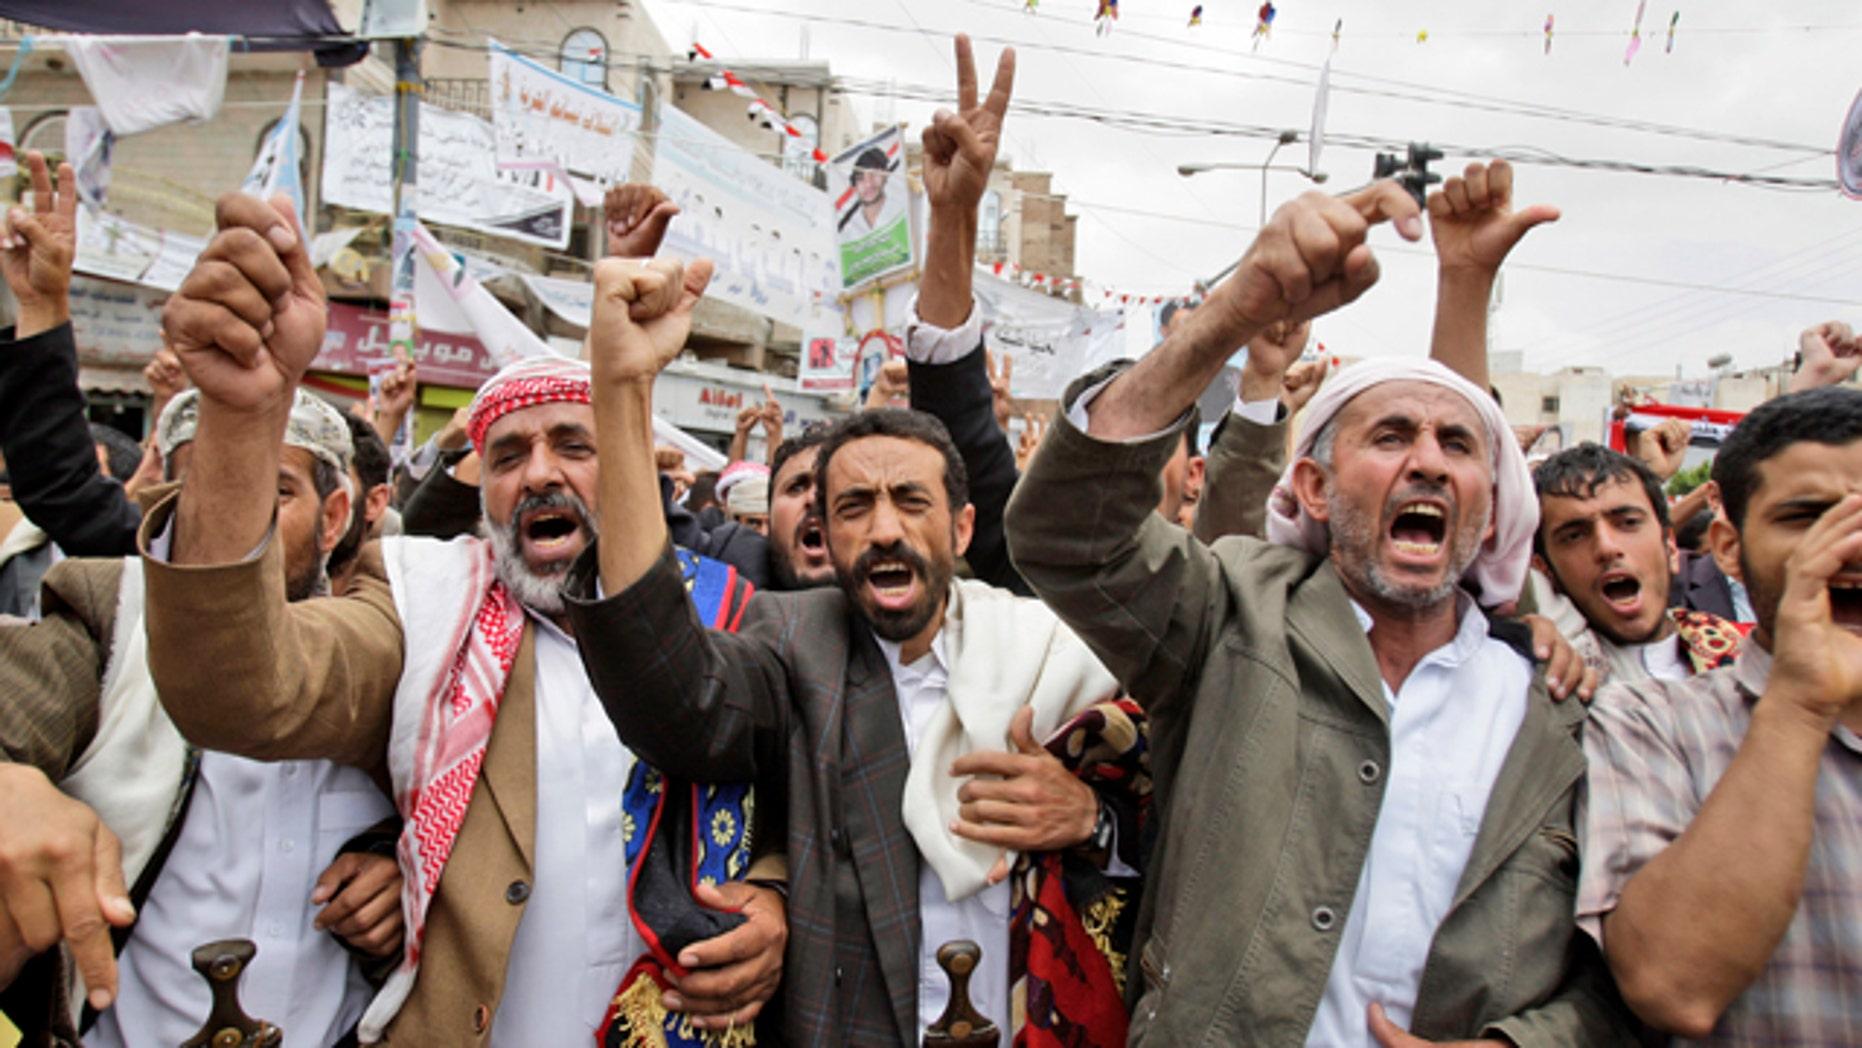 May 28: Anti-government protestors shout slogans during a demonstration demanding the resignation of Yemeni President Ali Abdullah Saleh in Sanaa, Yemen.